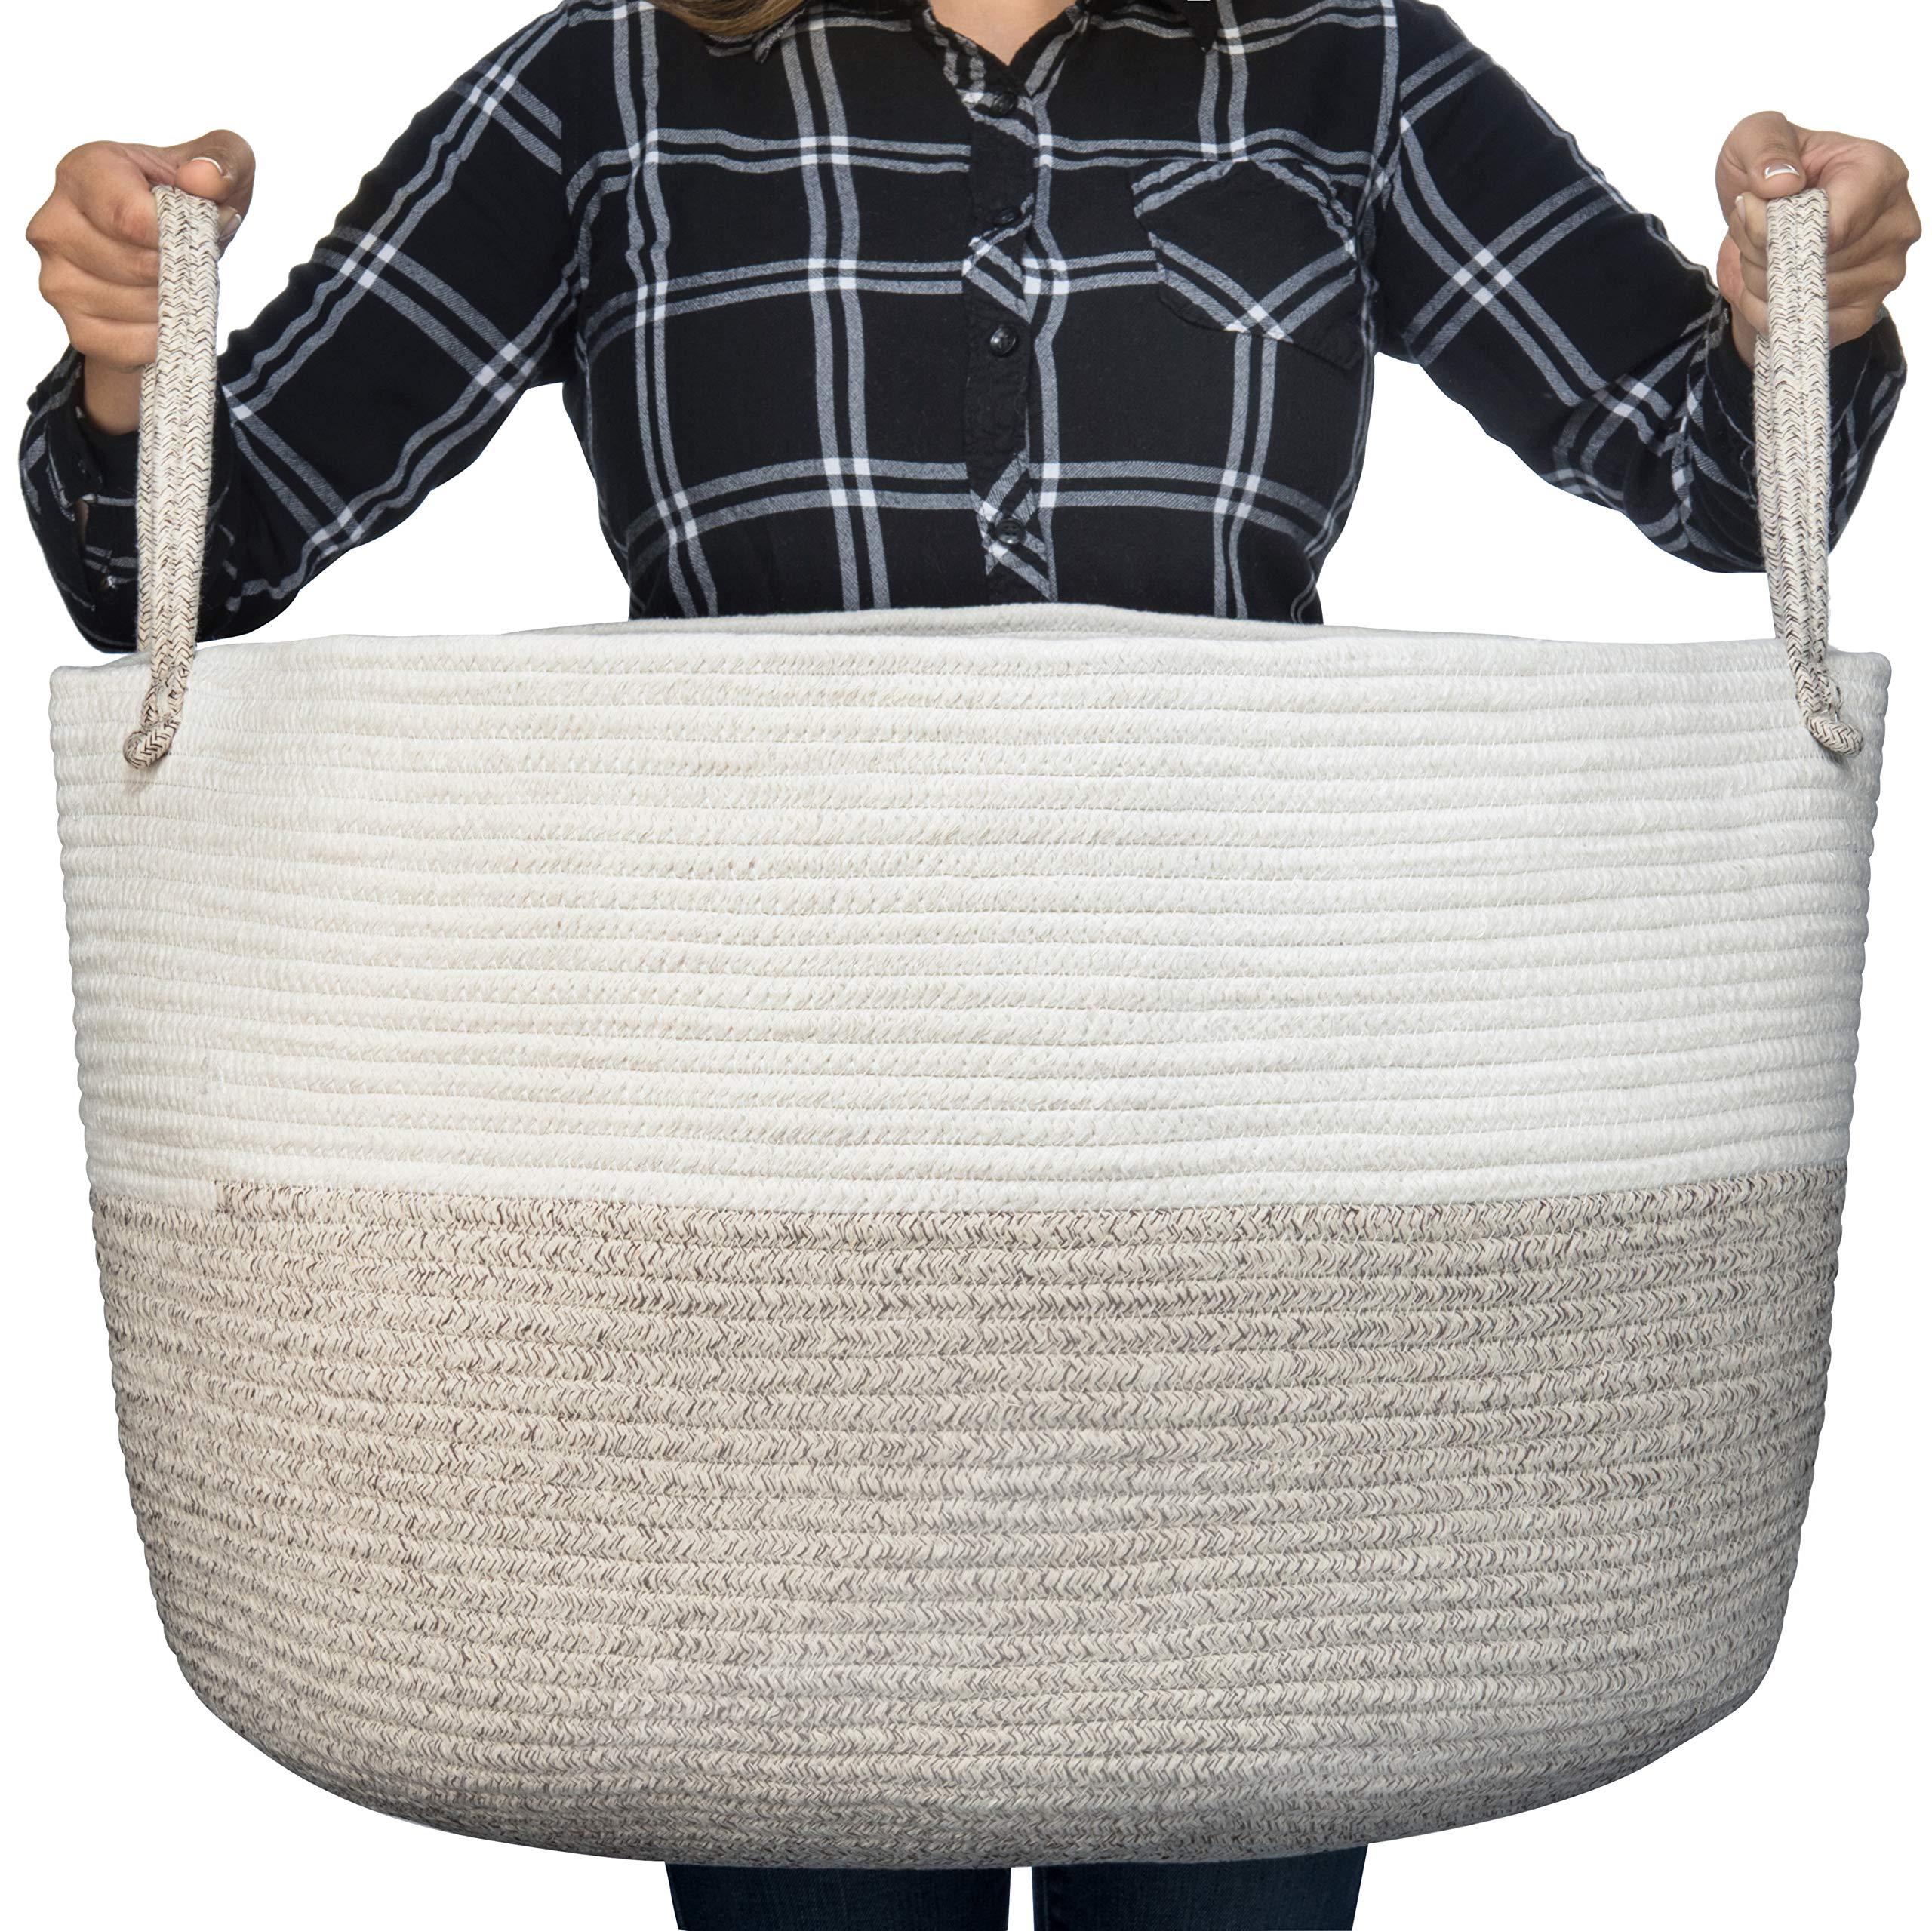 Luxury Little Nursery Storage Basket, Size XXXL :: 100% Cotton Rope Hamper with Handles :: Sturdy Baby Bin Organizer for Laundry, Toys, Blankets, Pillows & More, 22'' x 22'' x 14'', White/Beige